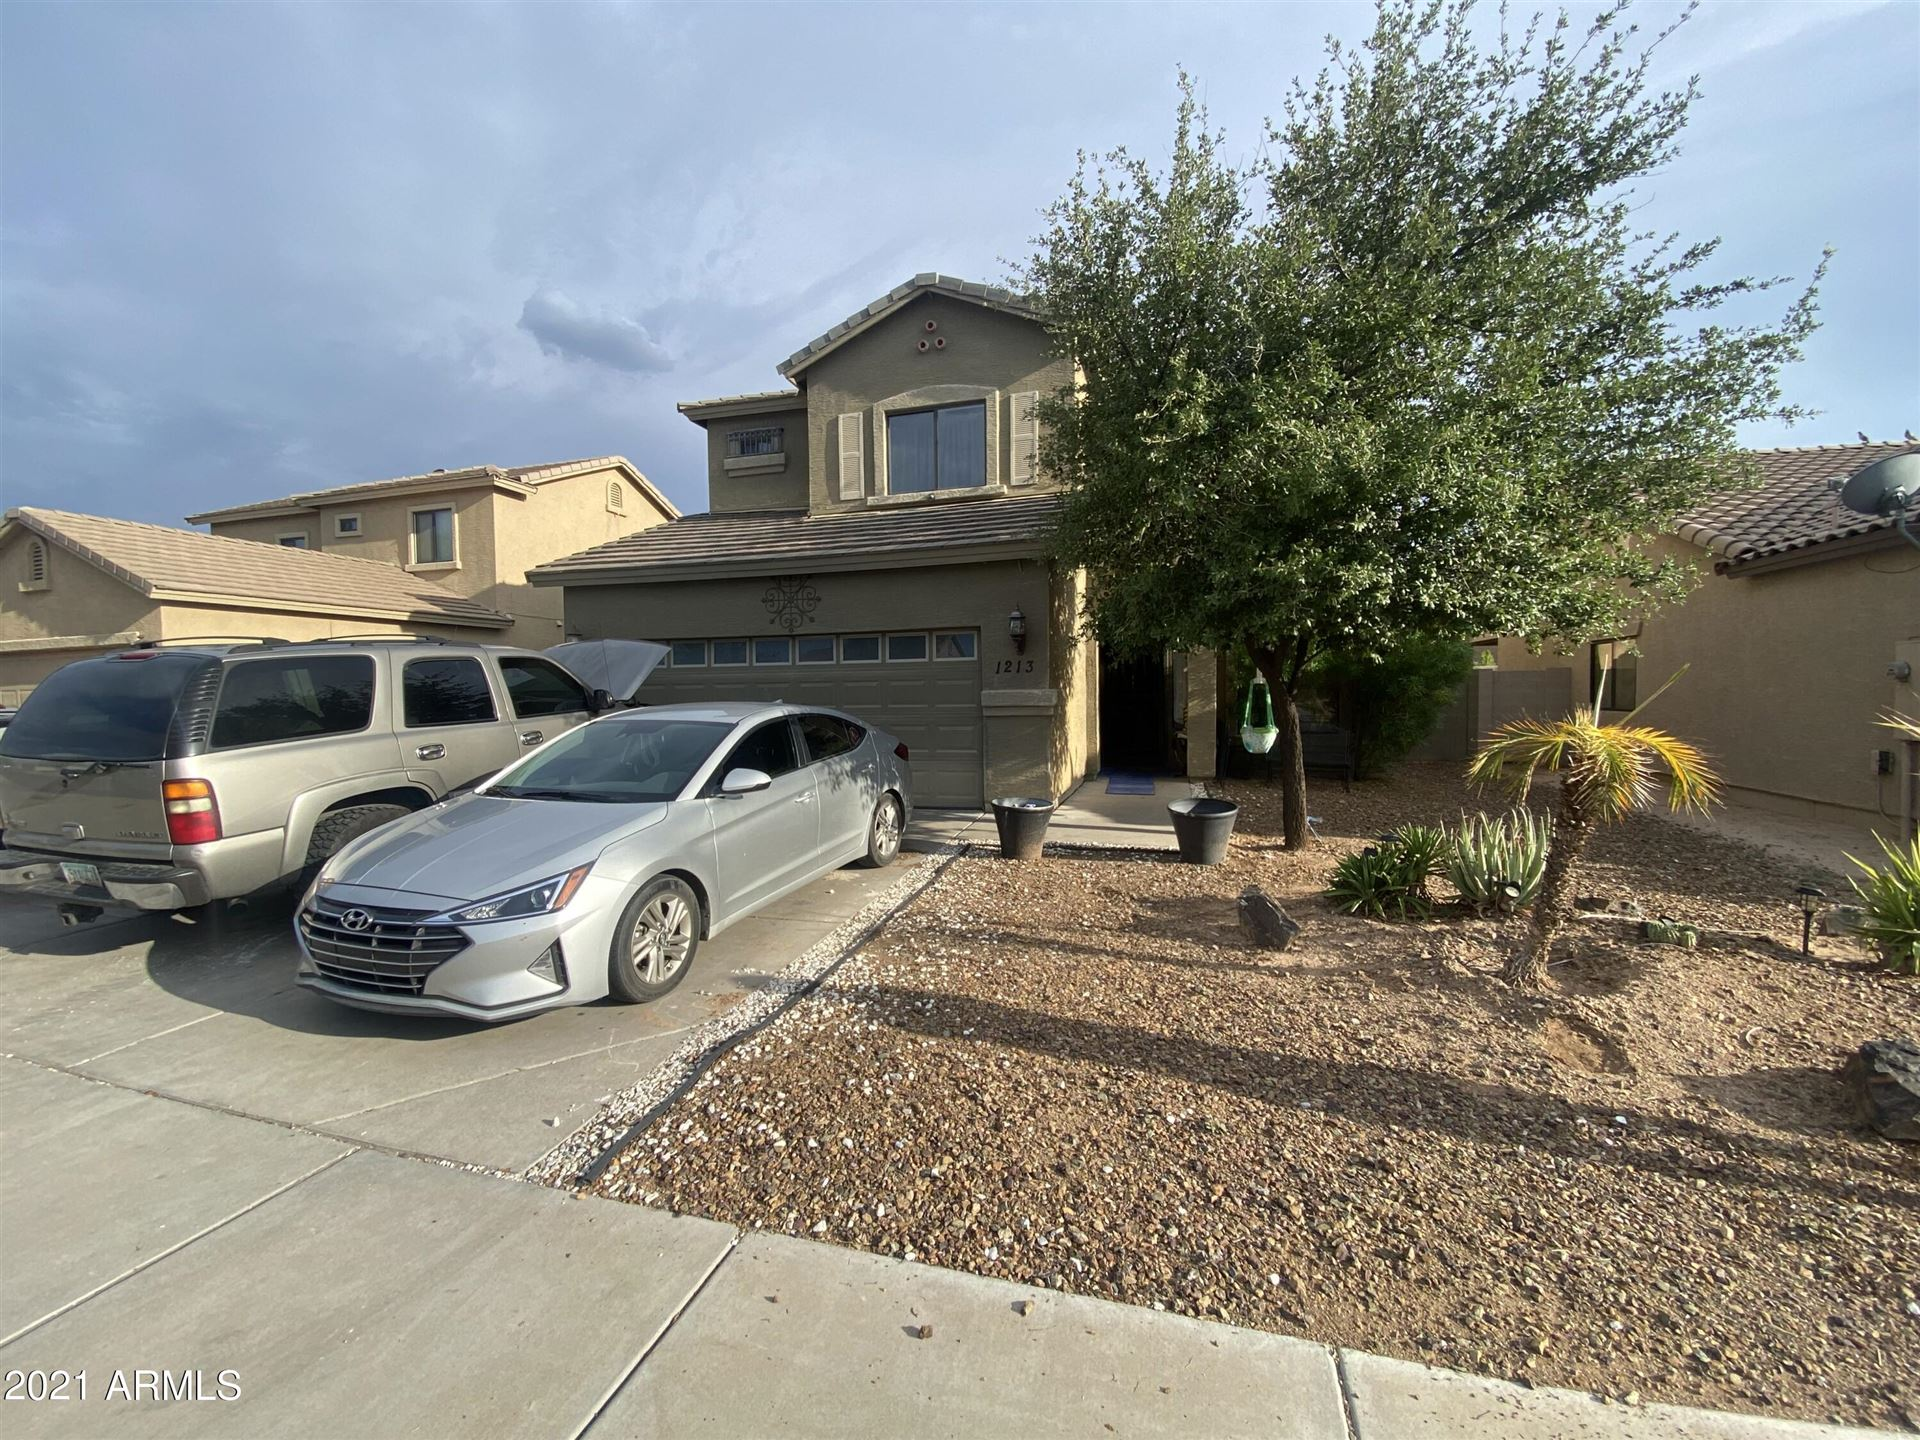 1213 W FREMONT Road, Phoenix, AZ 85041 - MLS#: 6270629